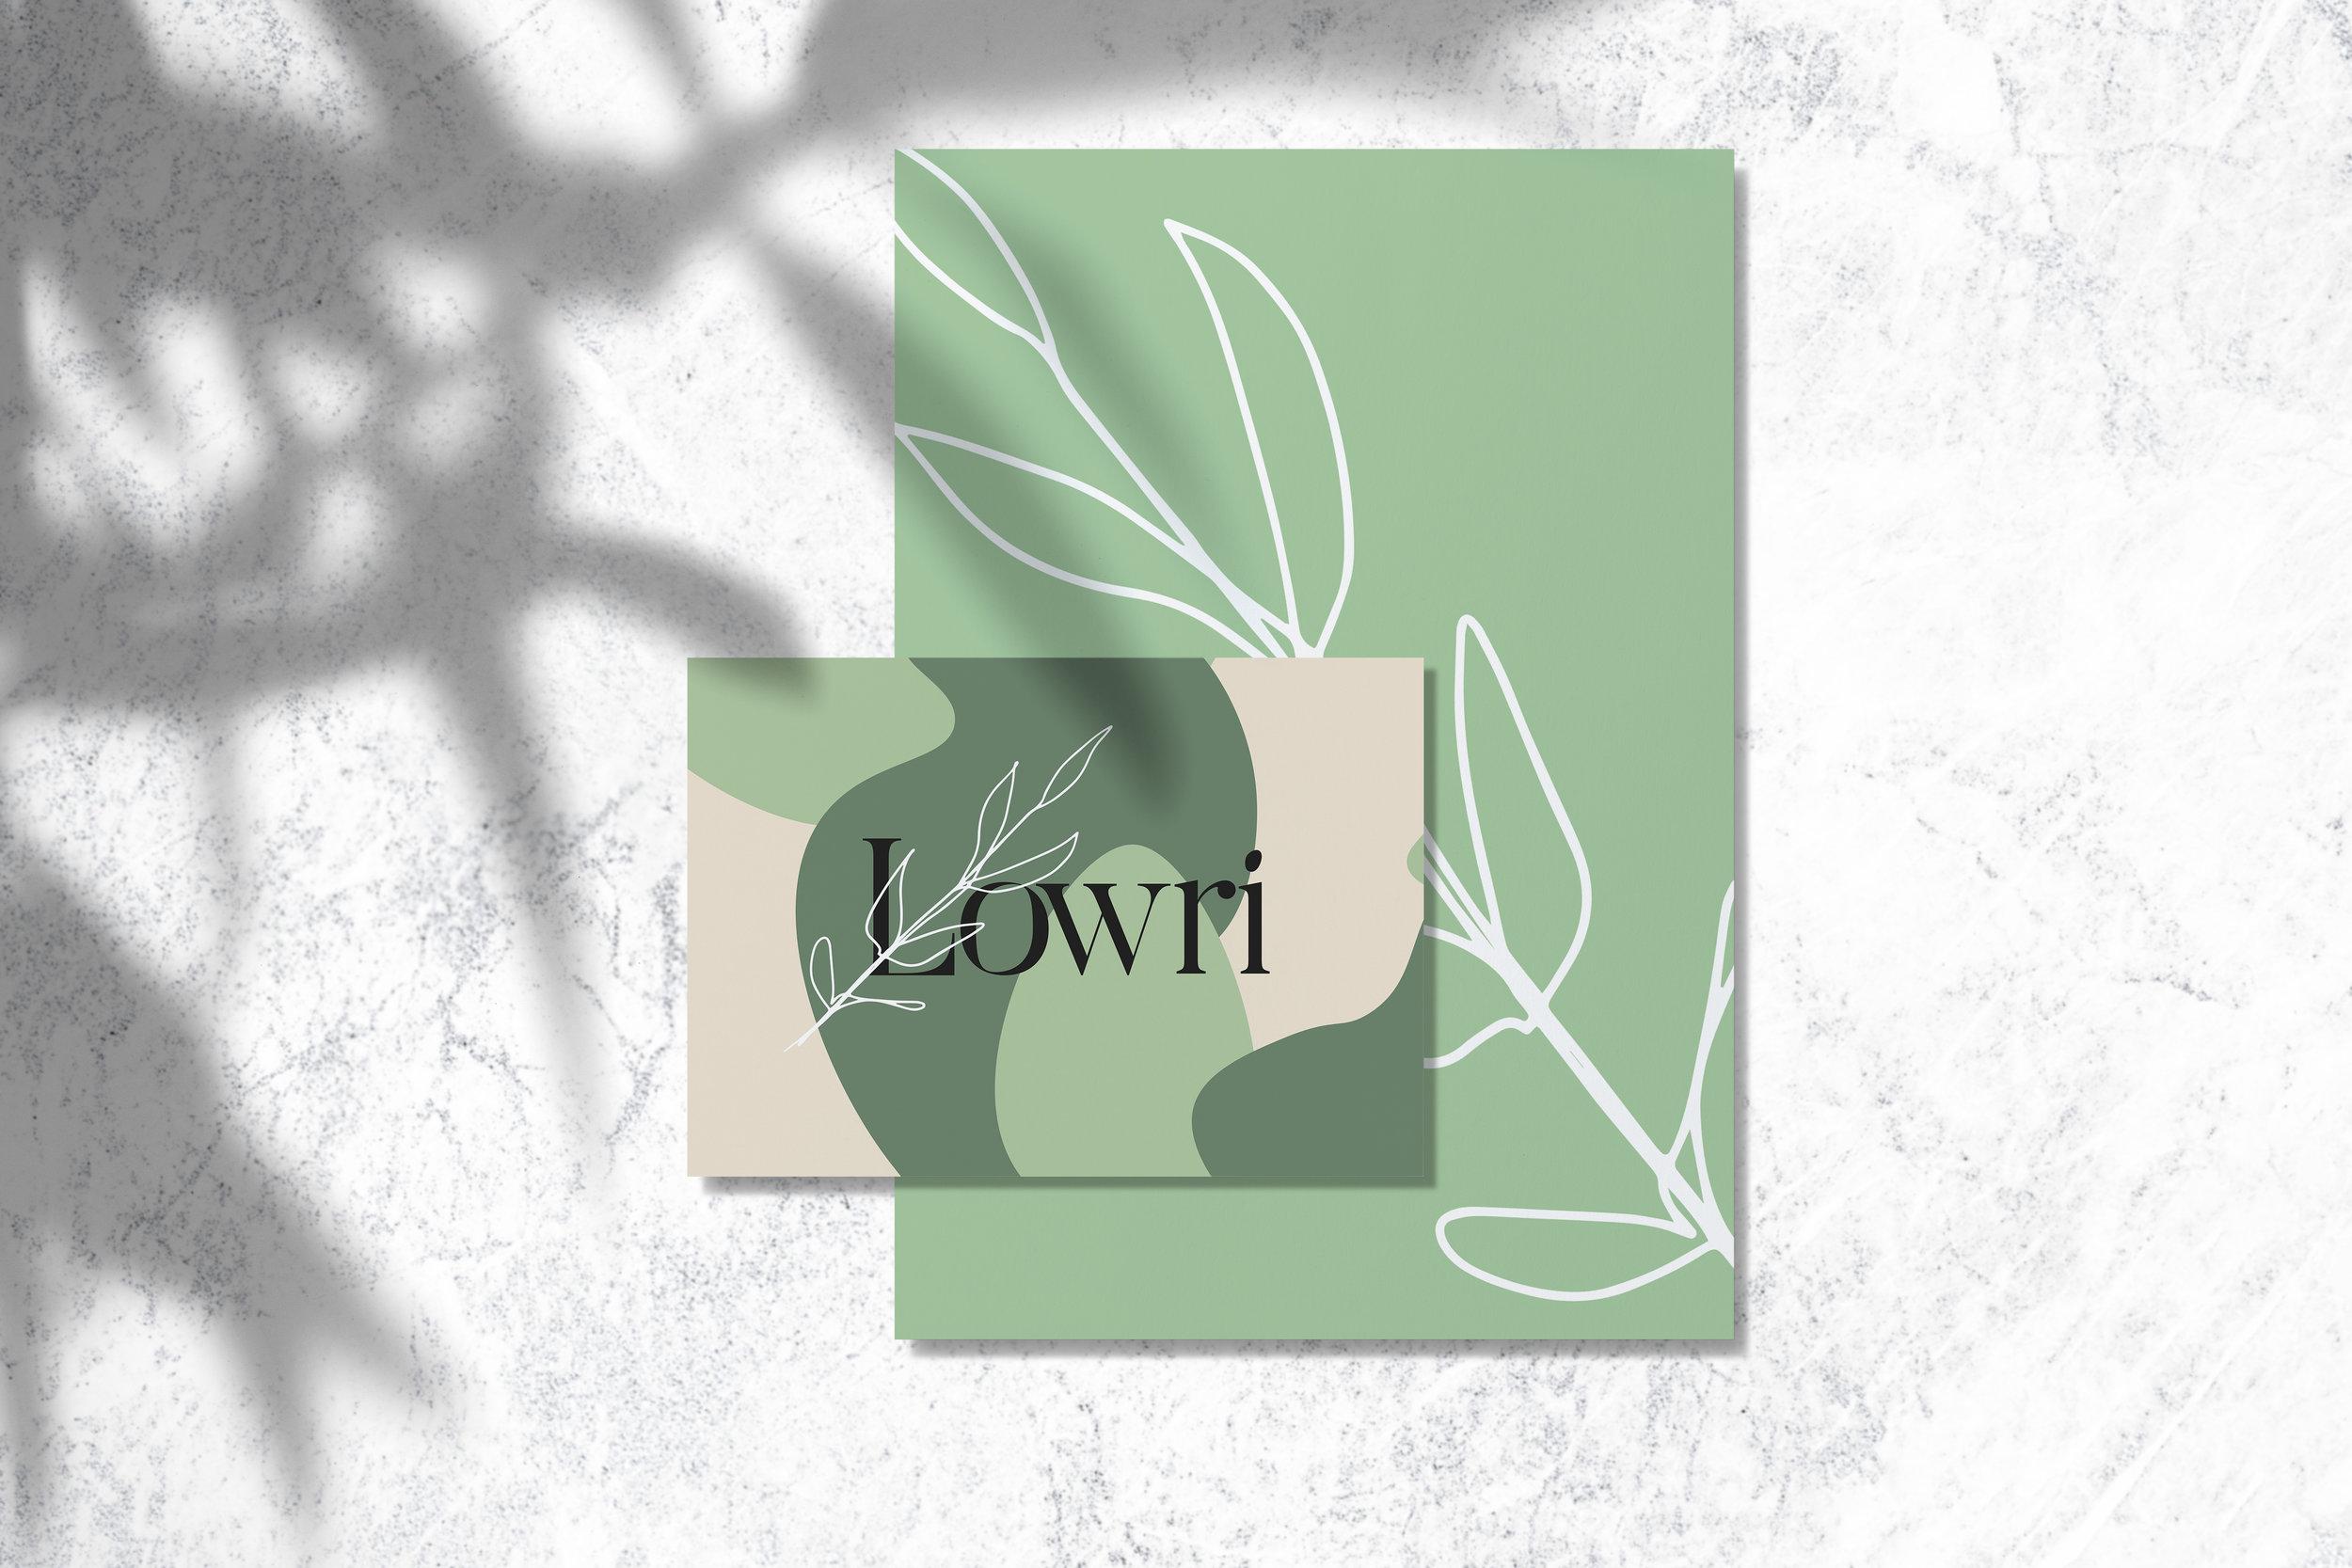 lowri2.jpg